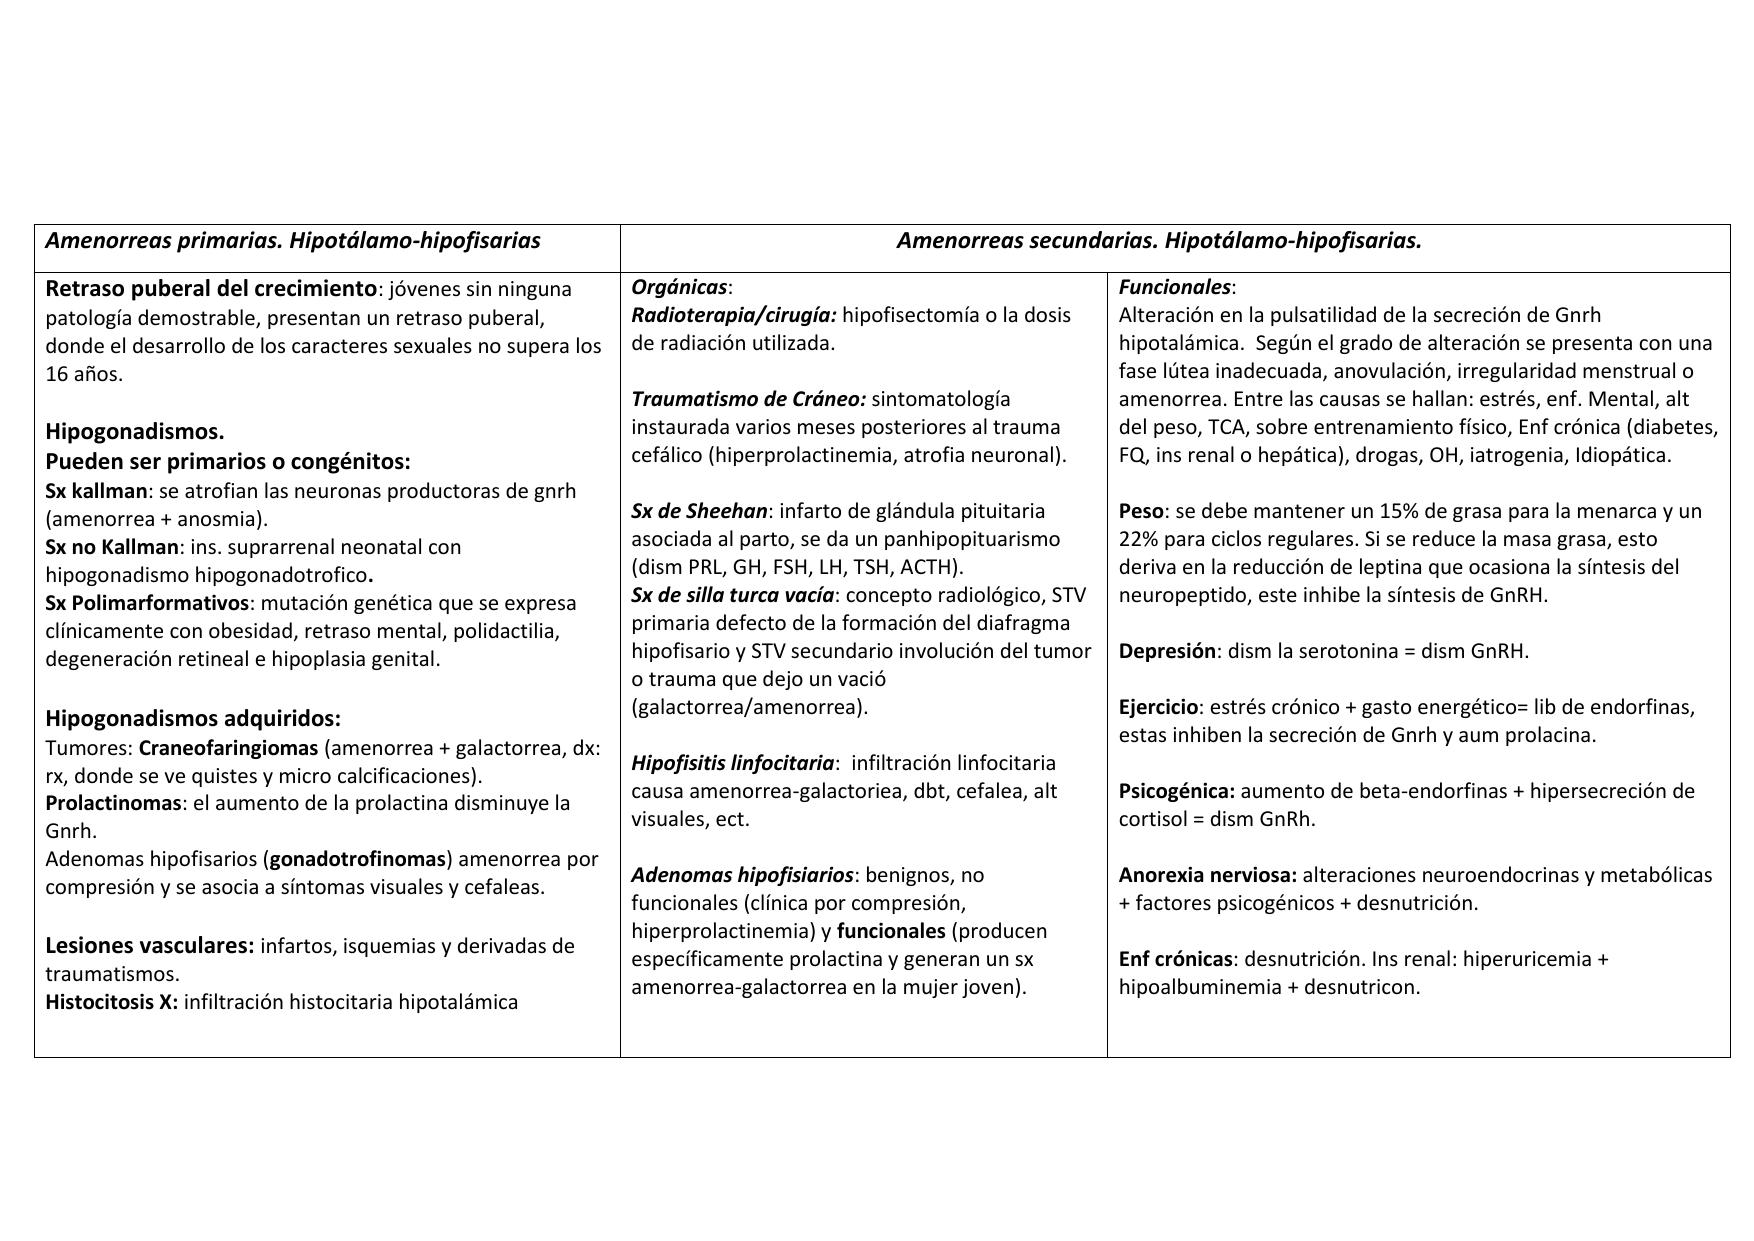 Amenorrea hipotalamica asociada a la perdida de peso